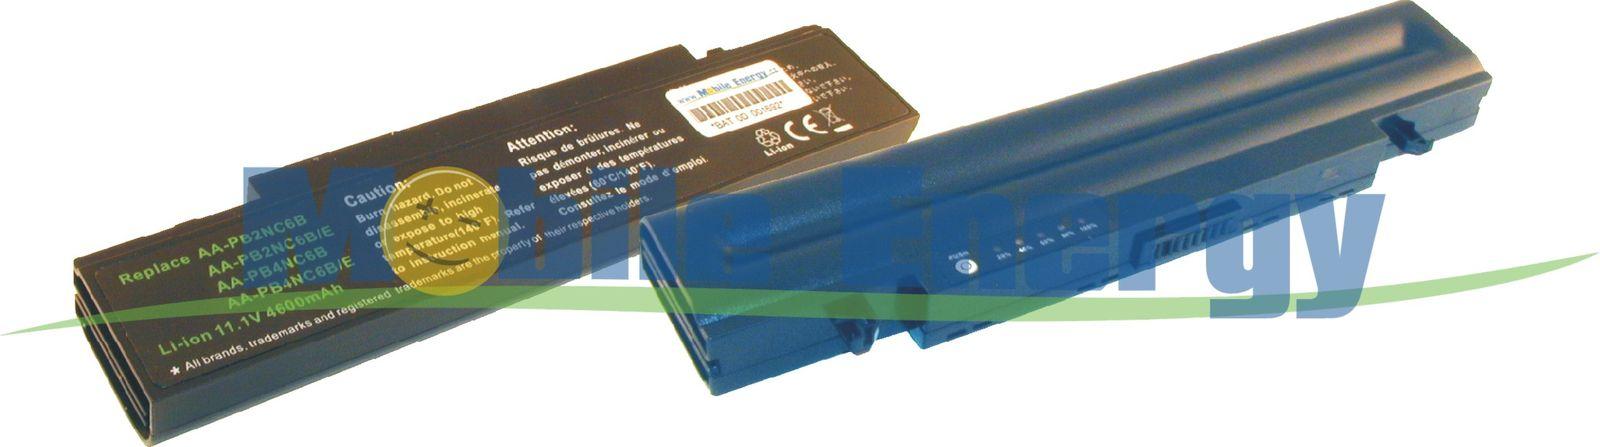 Mobile-Energy Baterie SAMSUNG P50 / P60 / R39 / R40 / R45 / R60